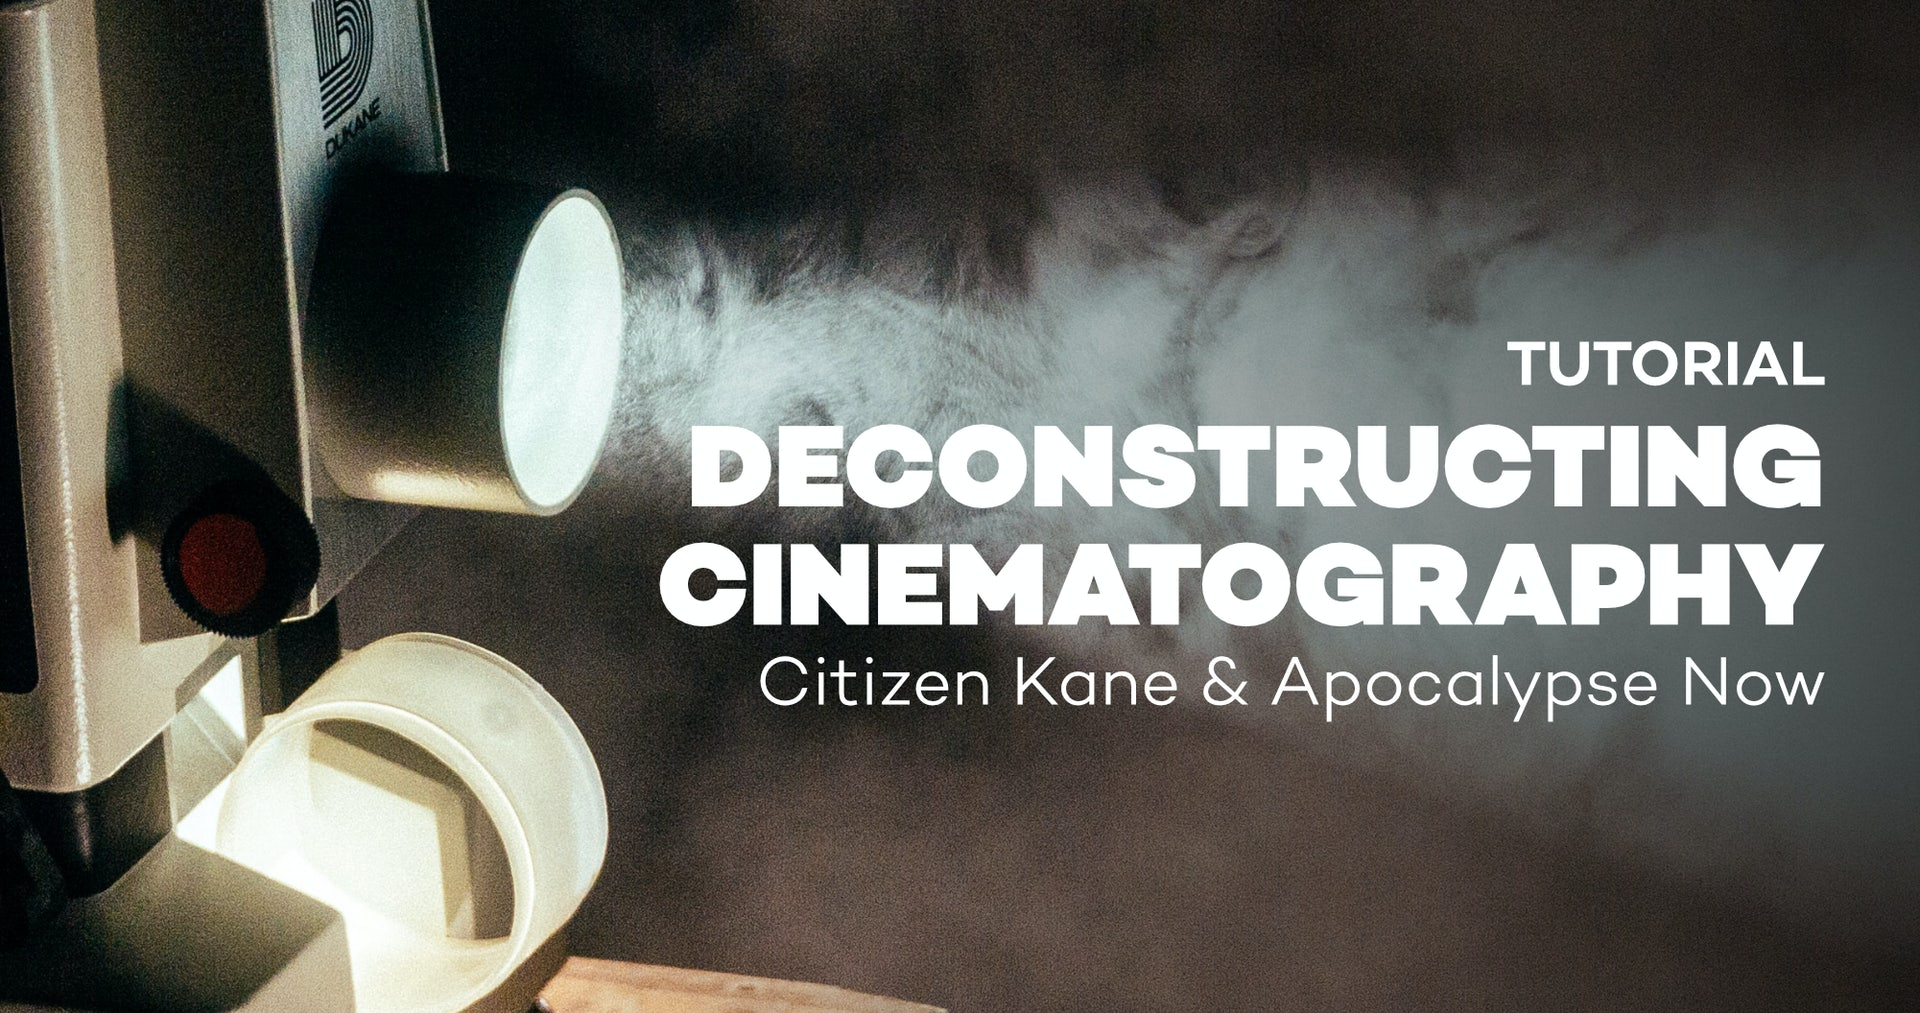 deconstructing cinematography